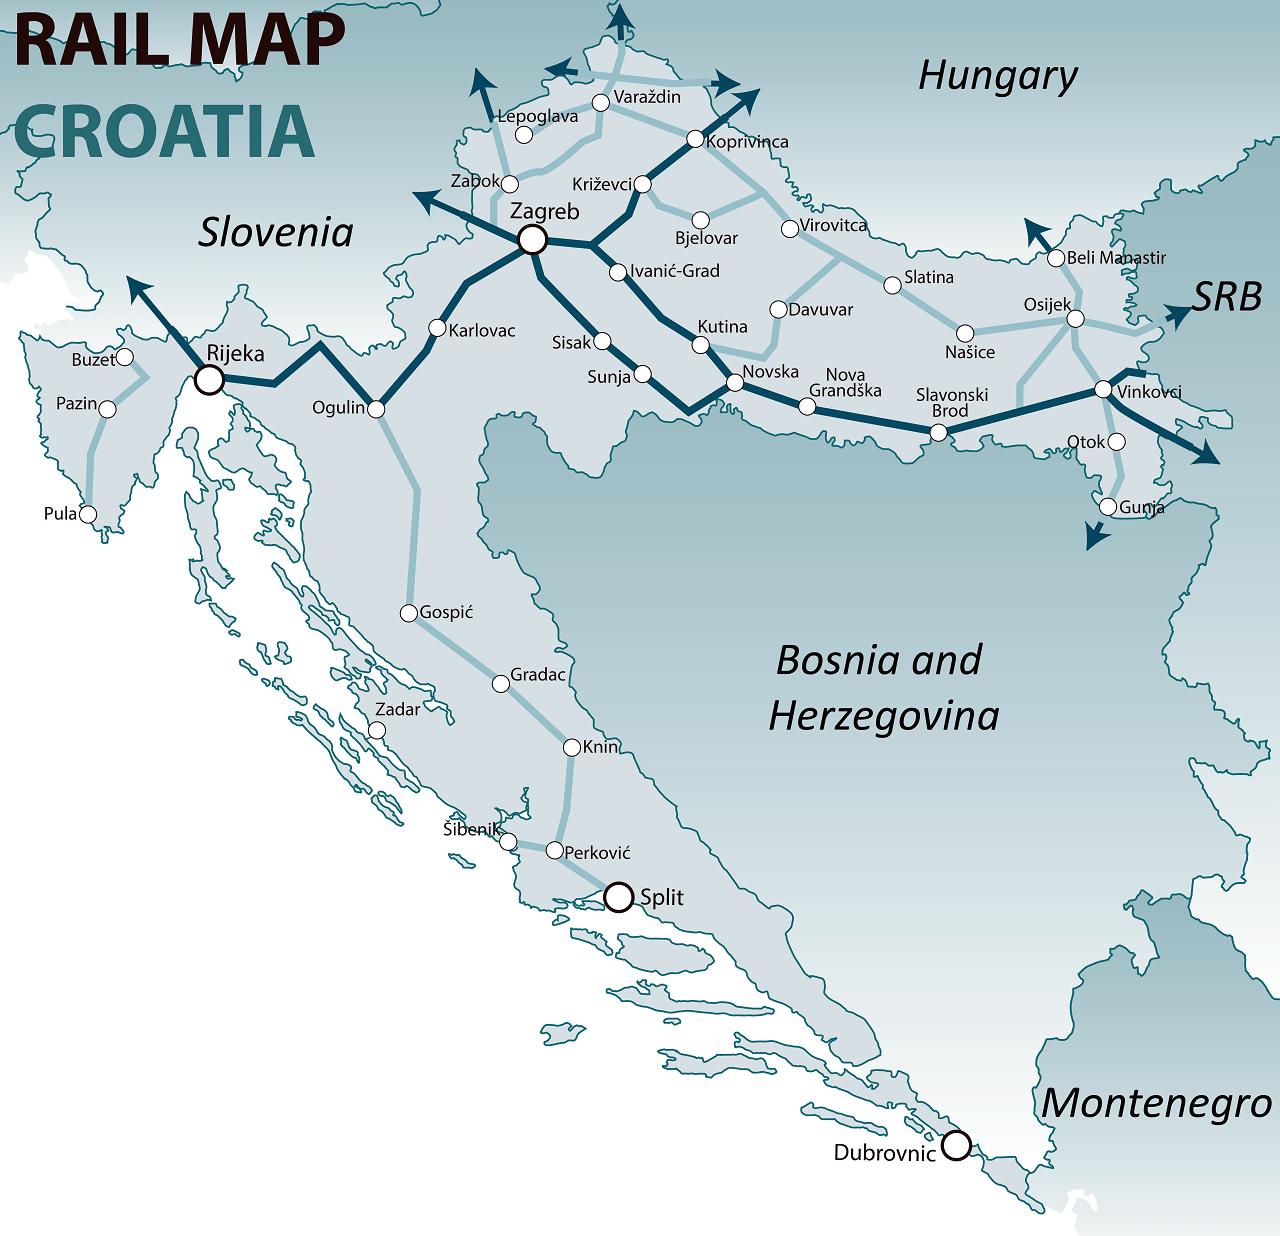 Croatia rail map